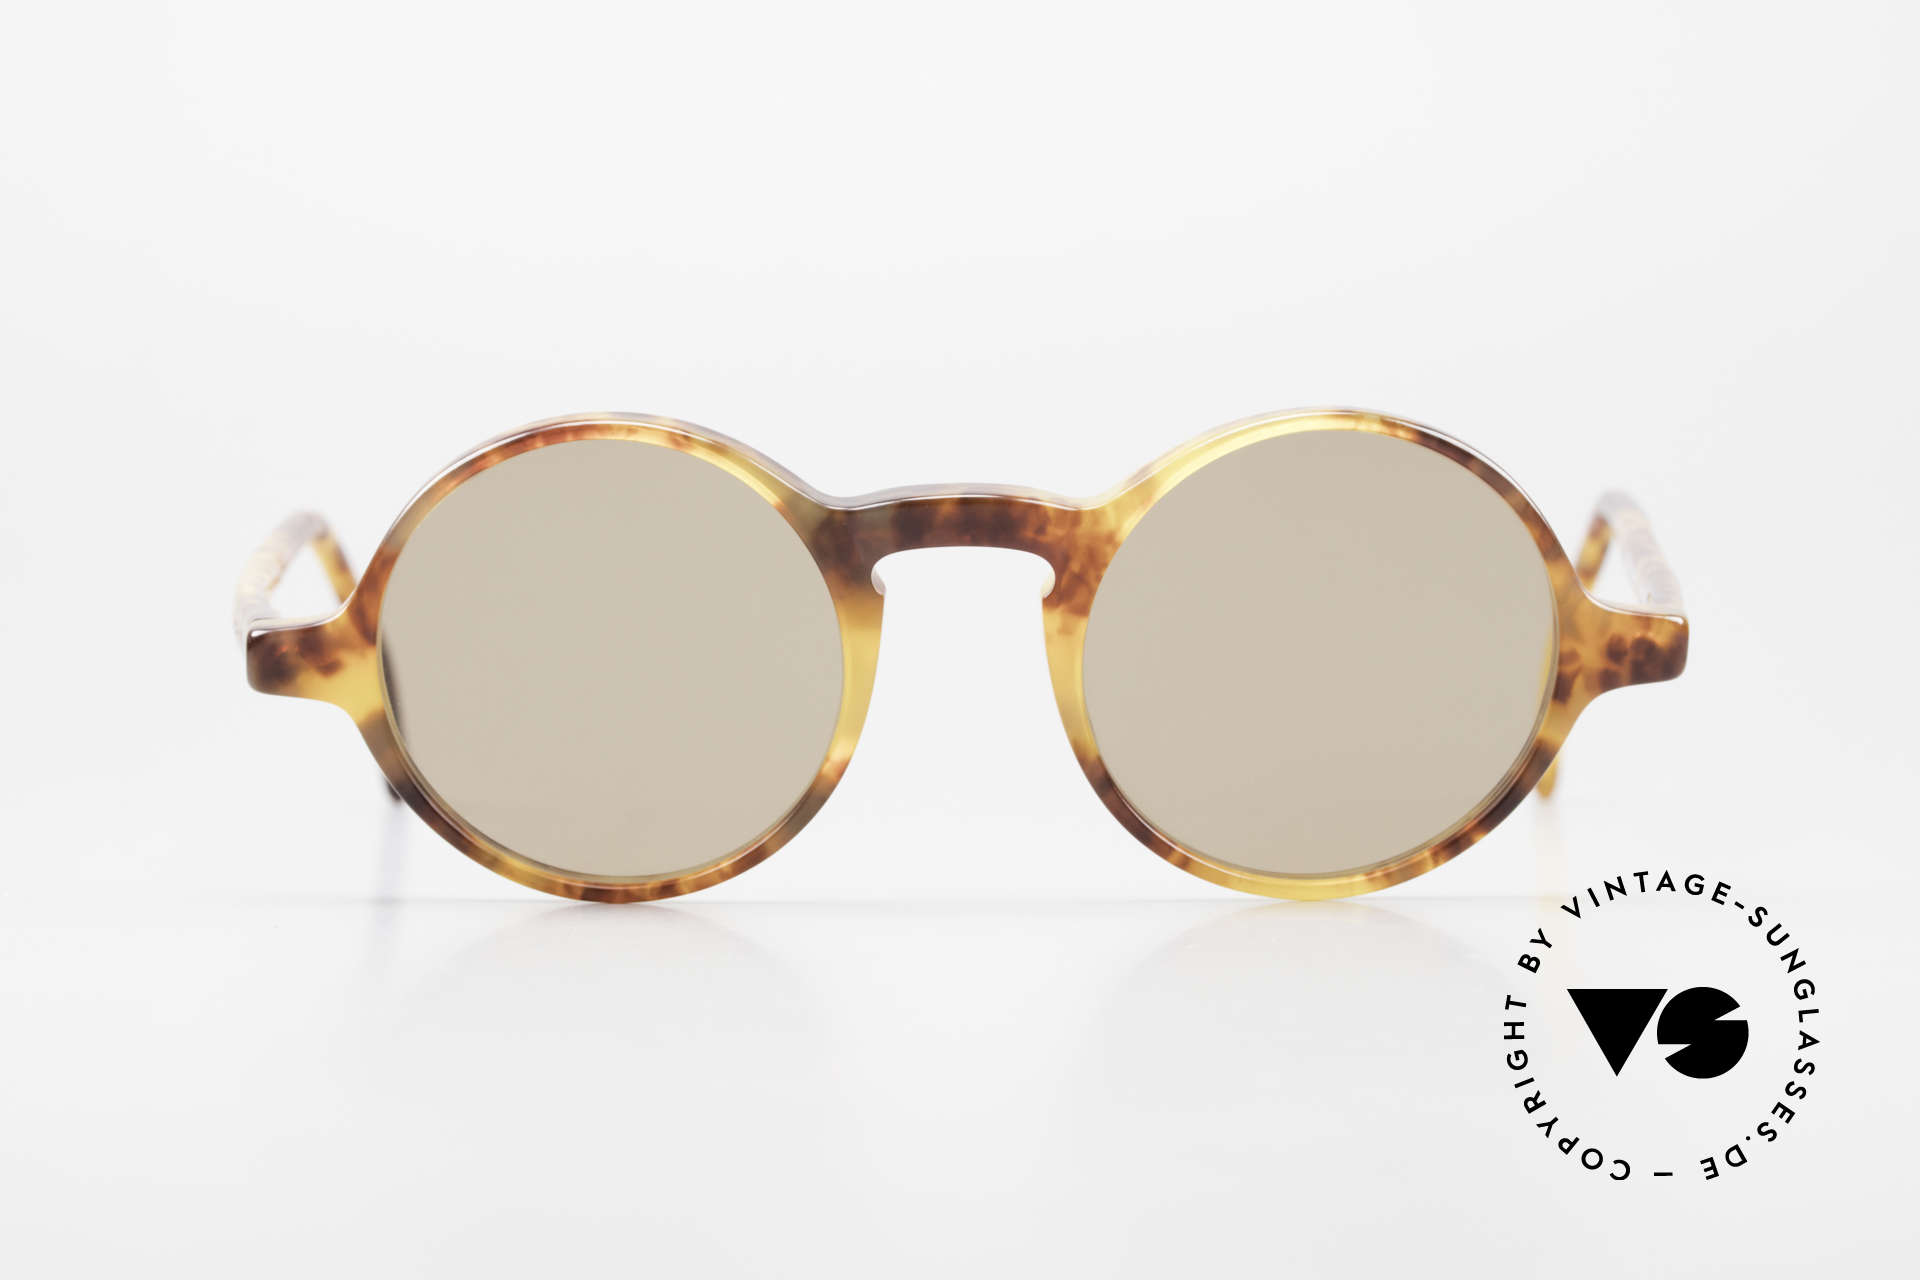 Giorgio Armani 324 Round 90's Designer Sunglasses, round frame design with interesting pattern (amber), Made for Men